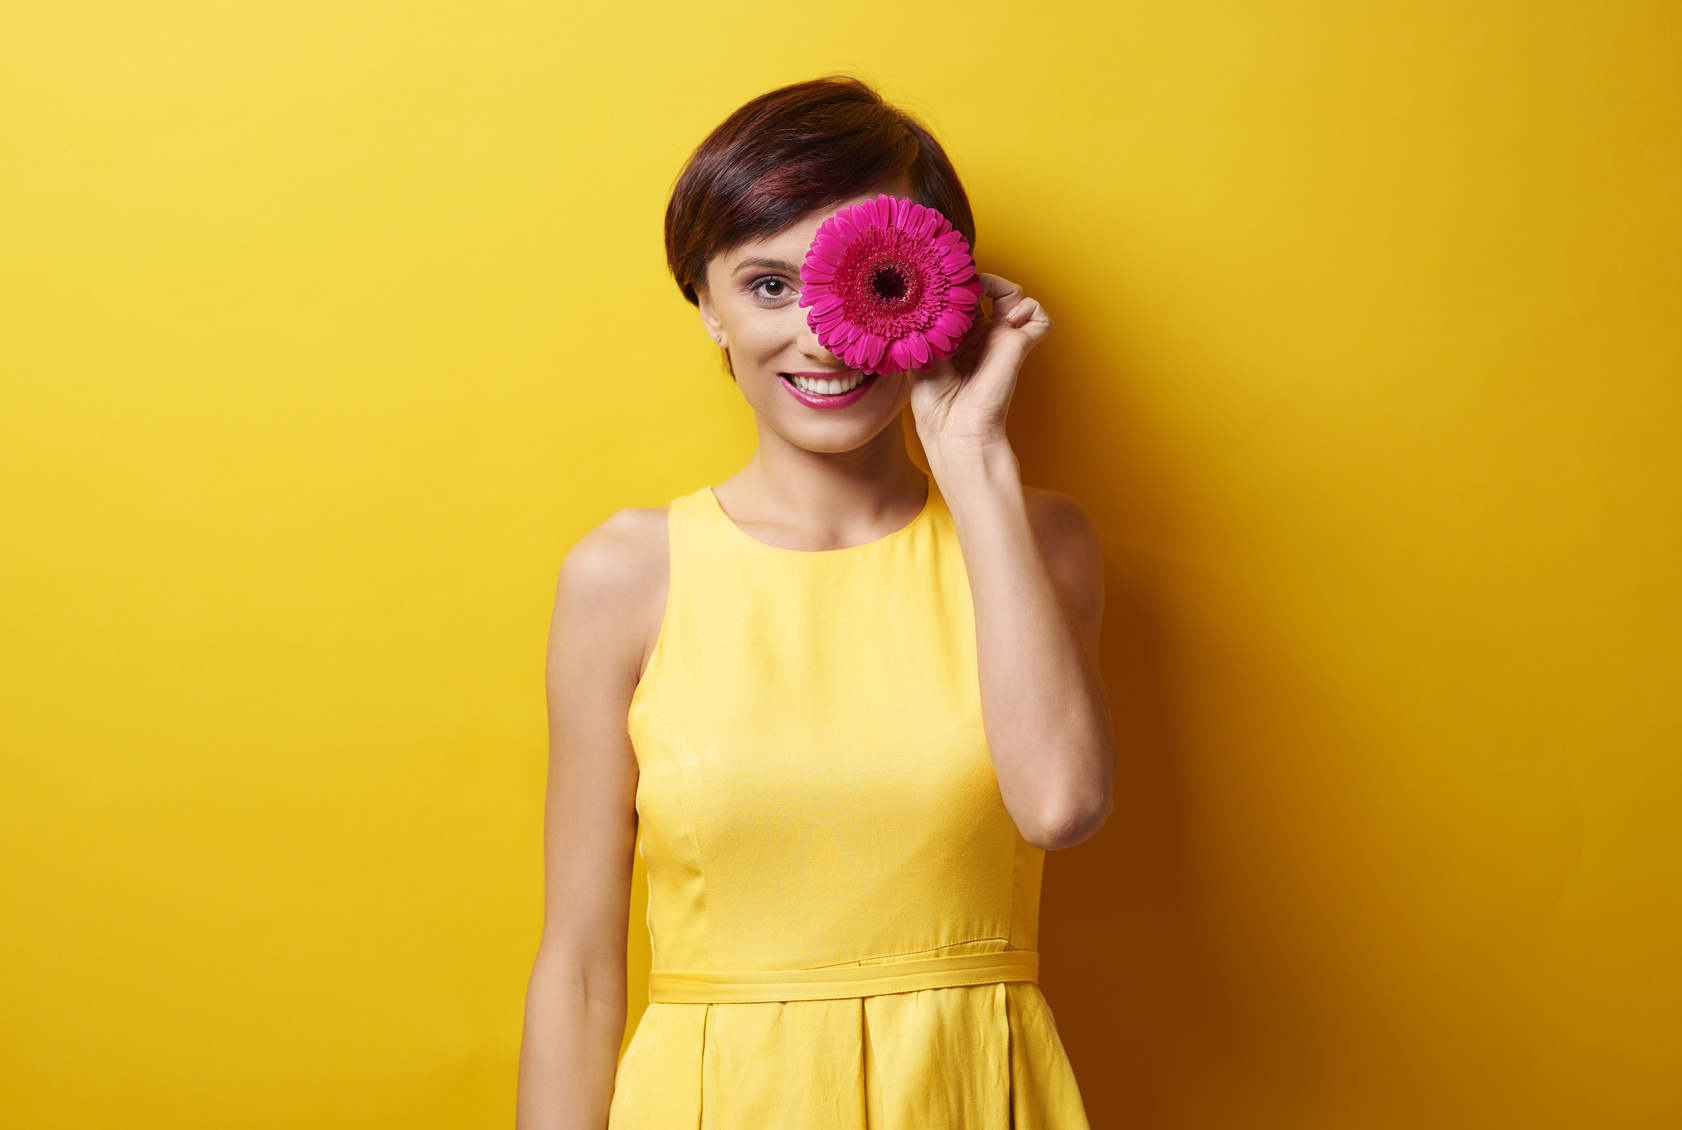 clinica oftalmologica ocumed verano